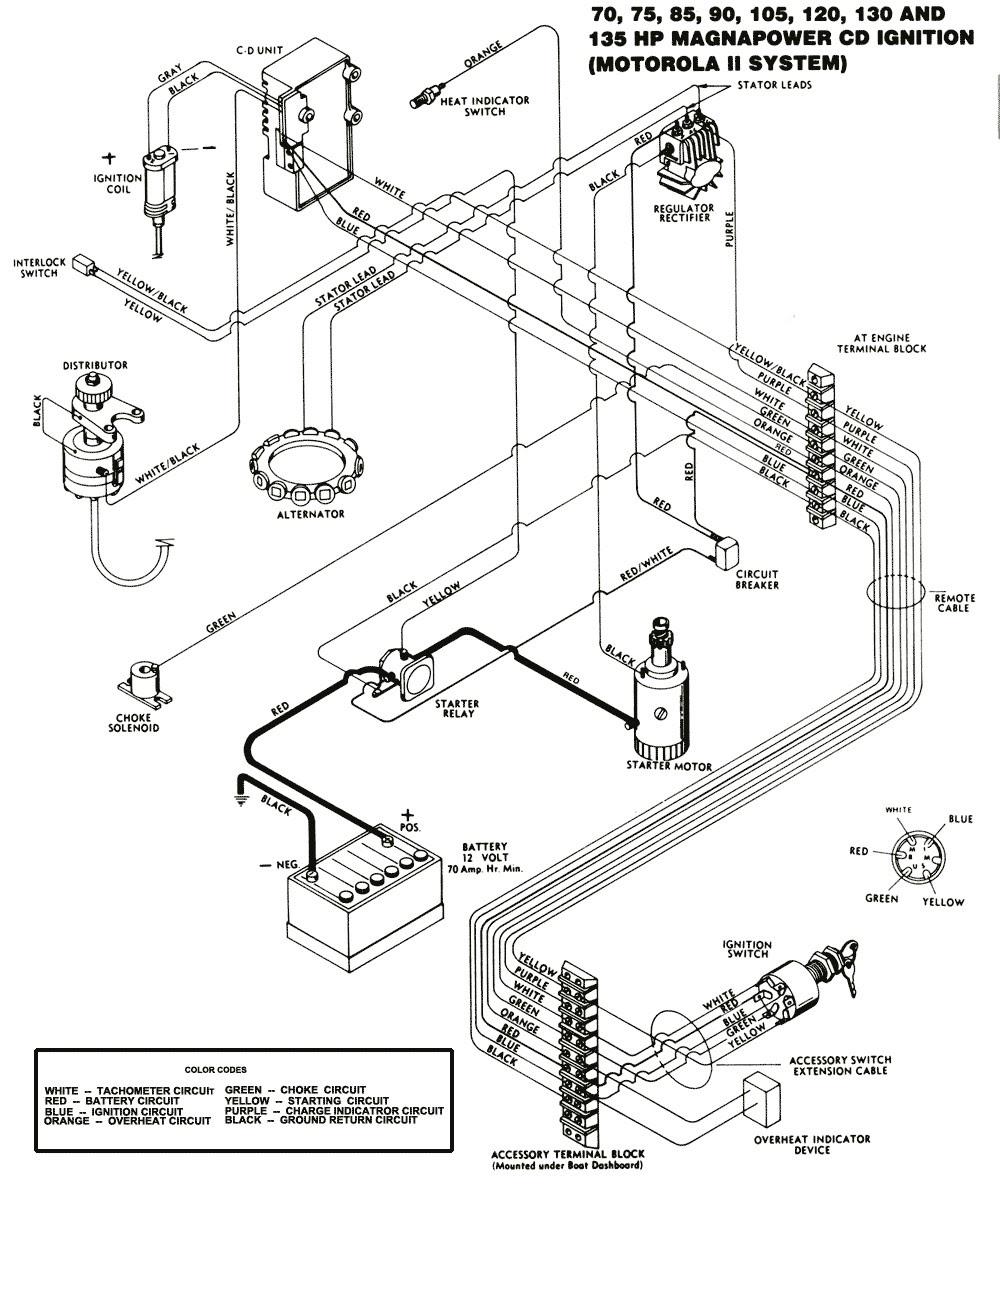 Diagram 86 Mercury 115 Hp Wiring Diagram Full Version Hd Quality Wiring Diagram Wiringklang2f Atuttasosta It